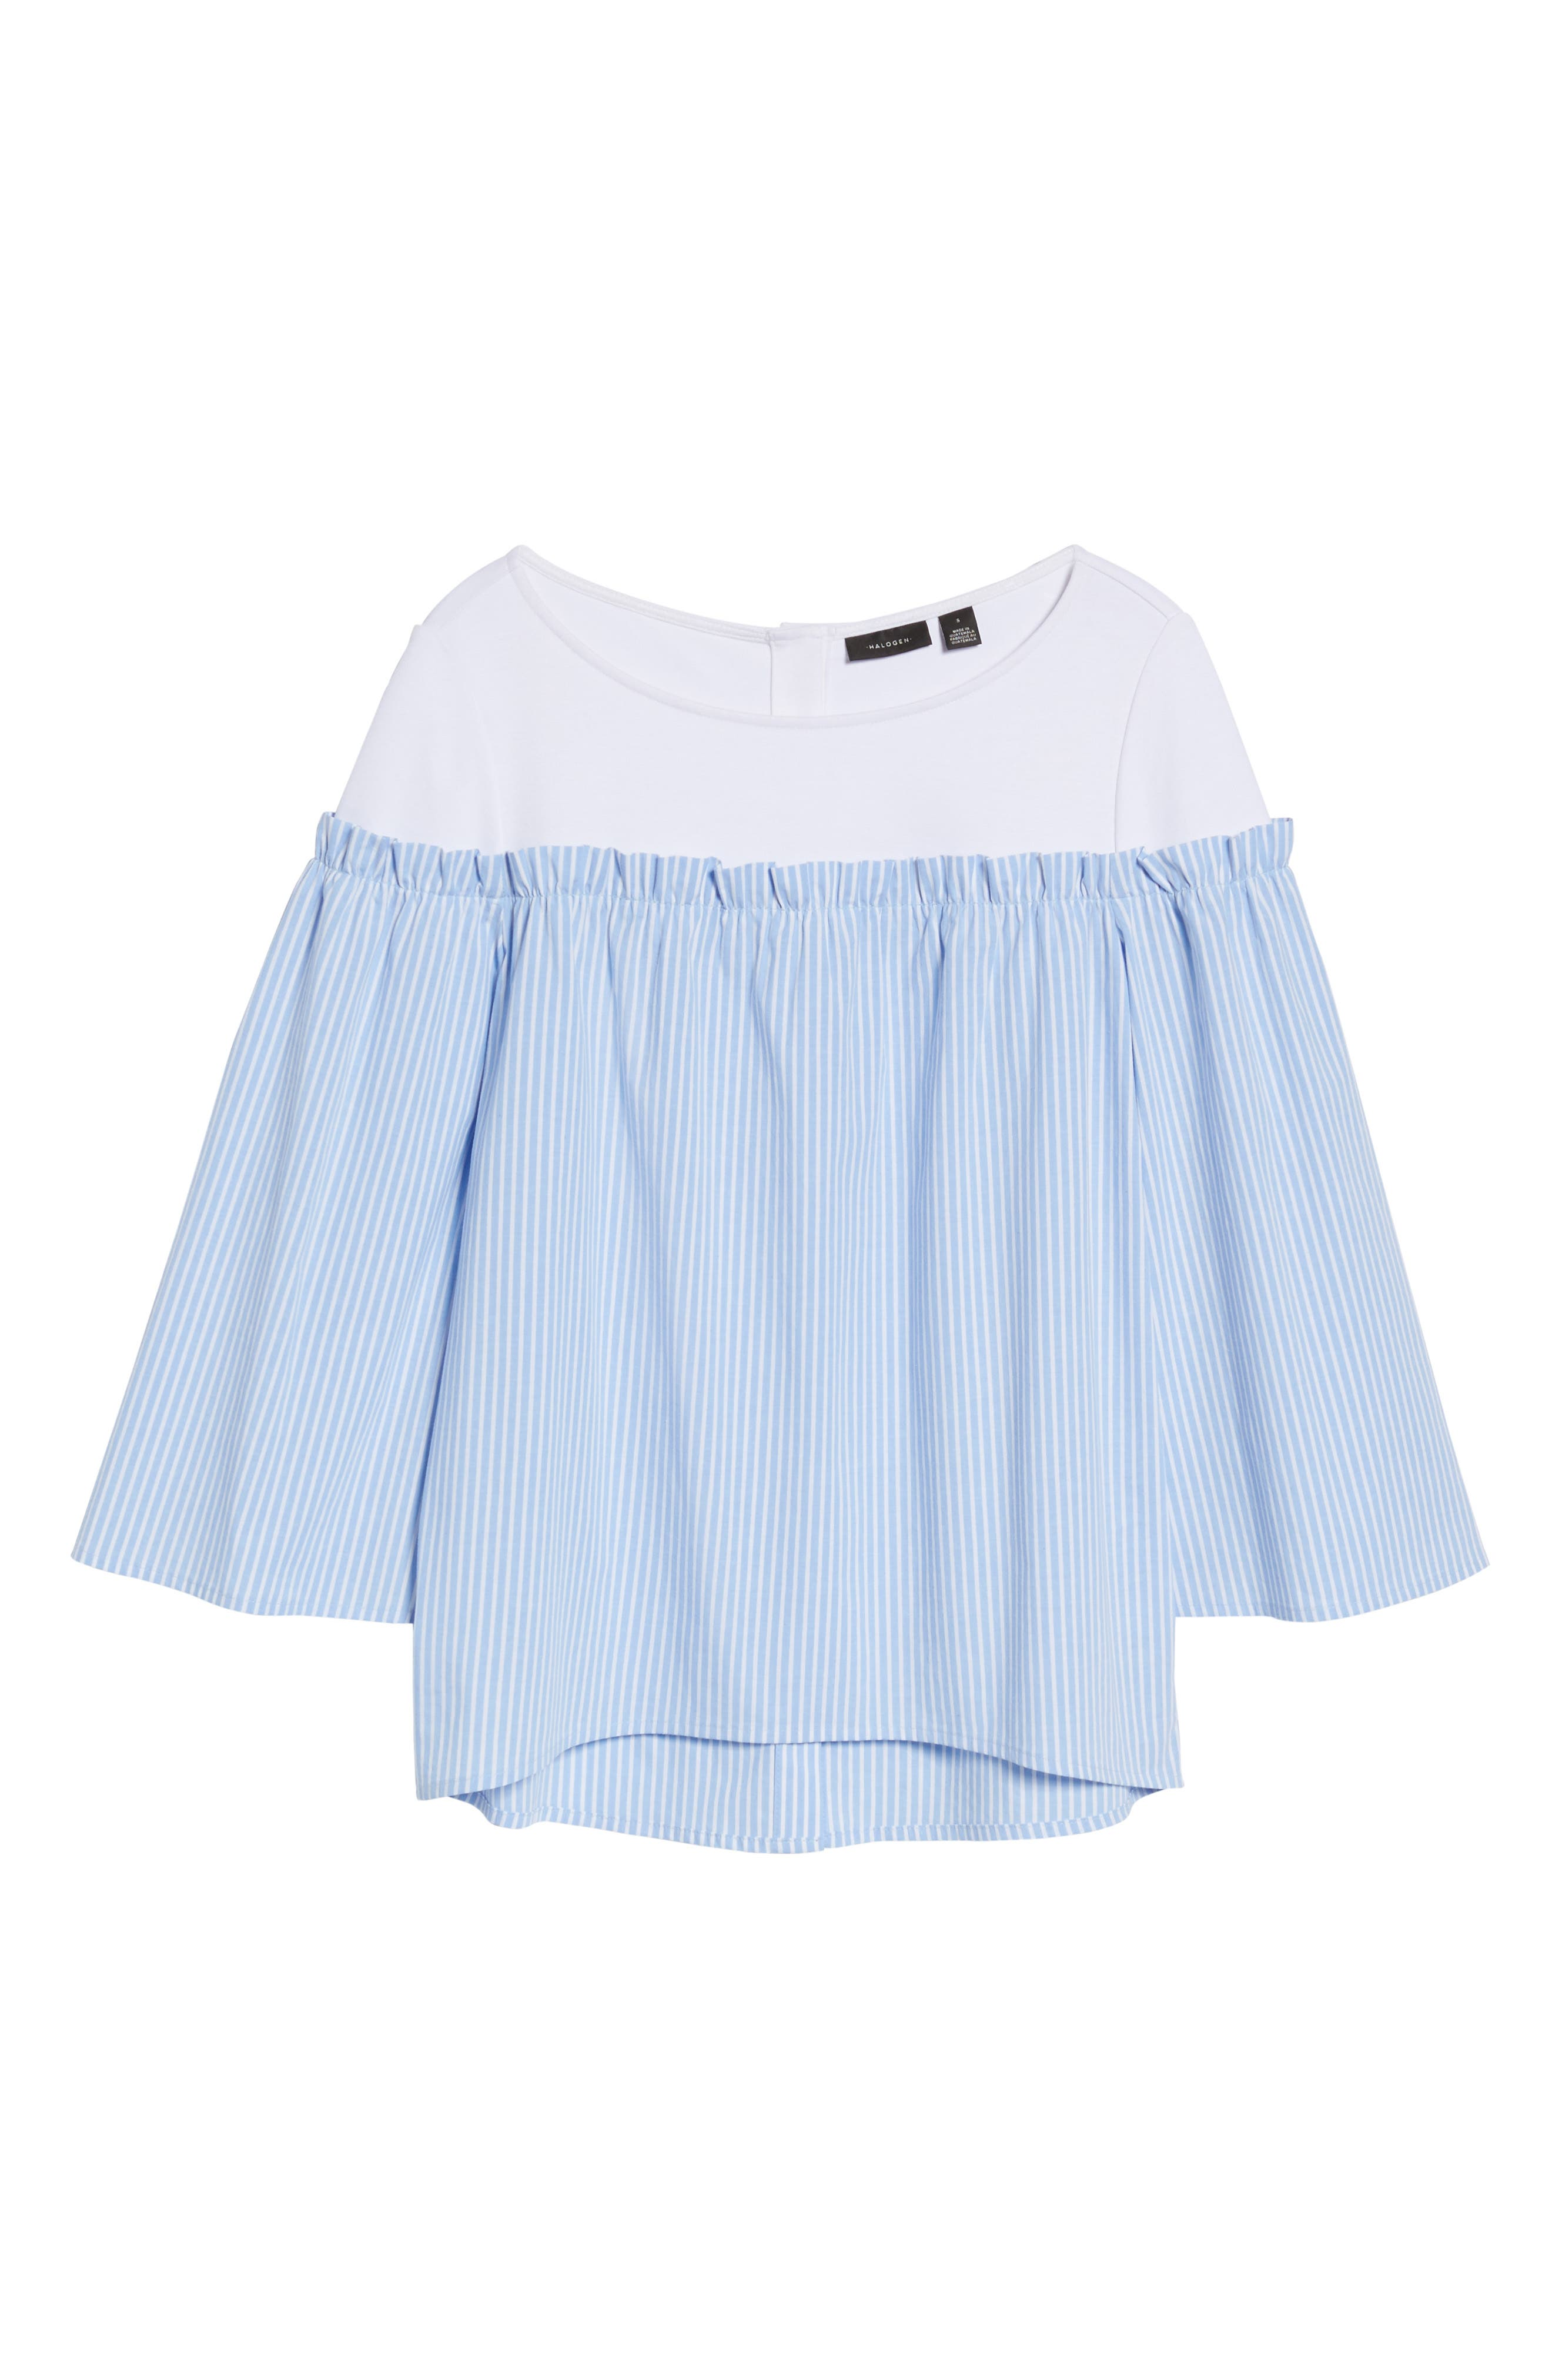 Ruffle Detail Mix Media High/Low Shirt,                             Alternate thumbnail 6, color,                             Blue- White Stripe